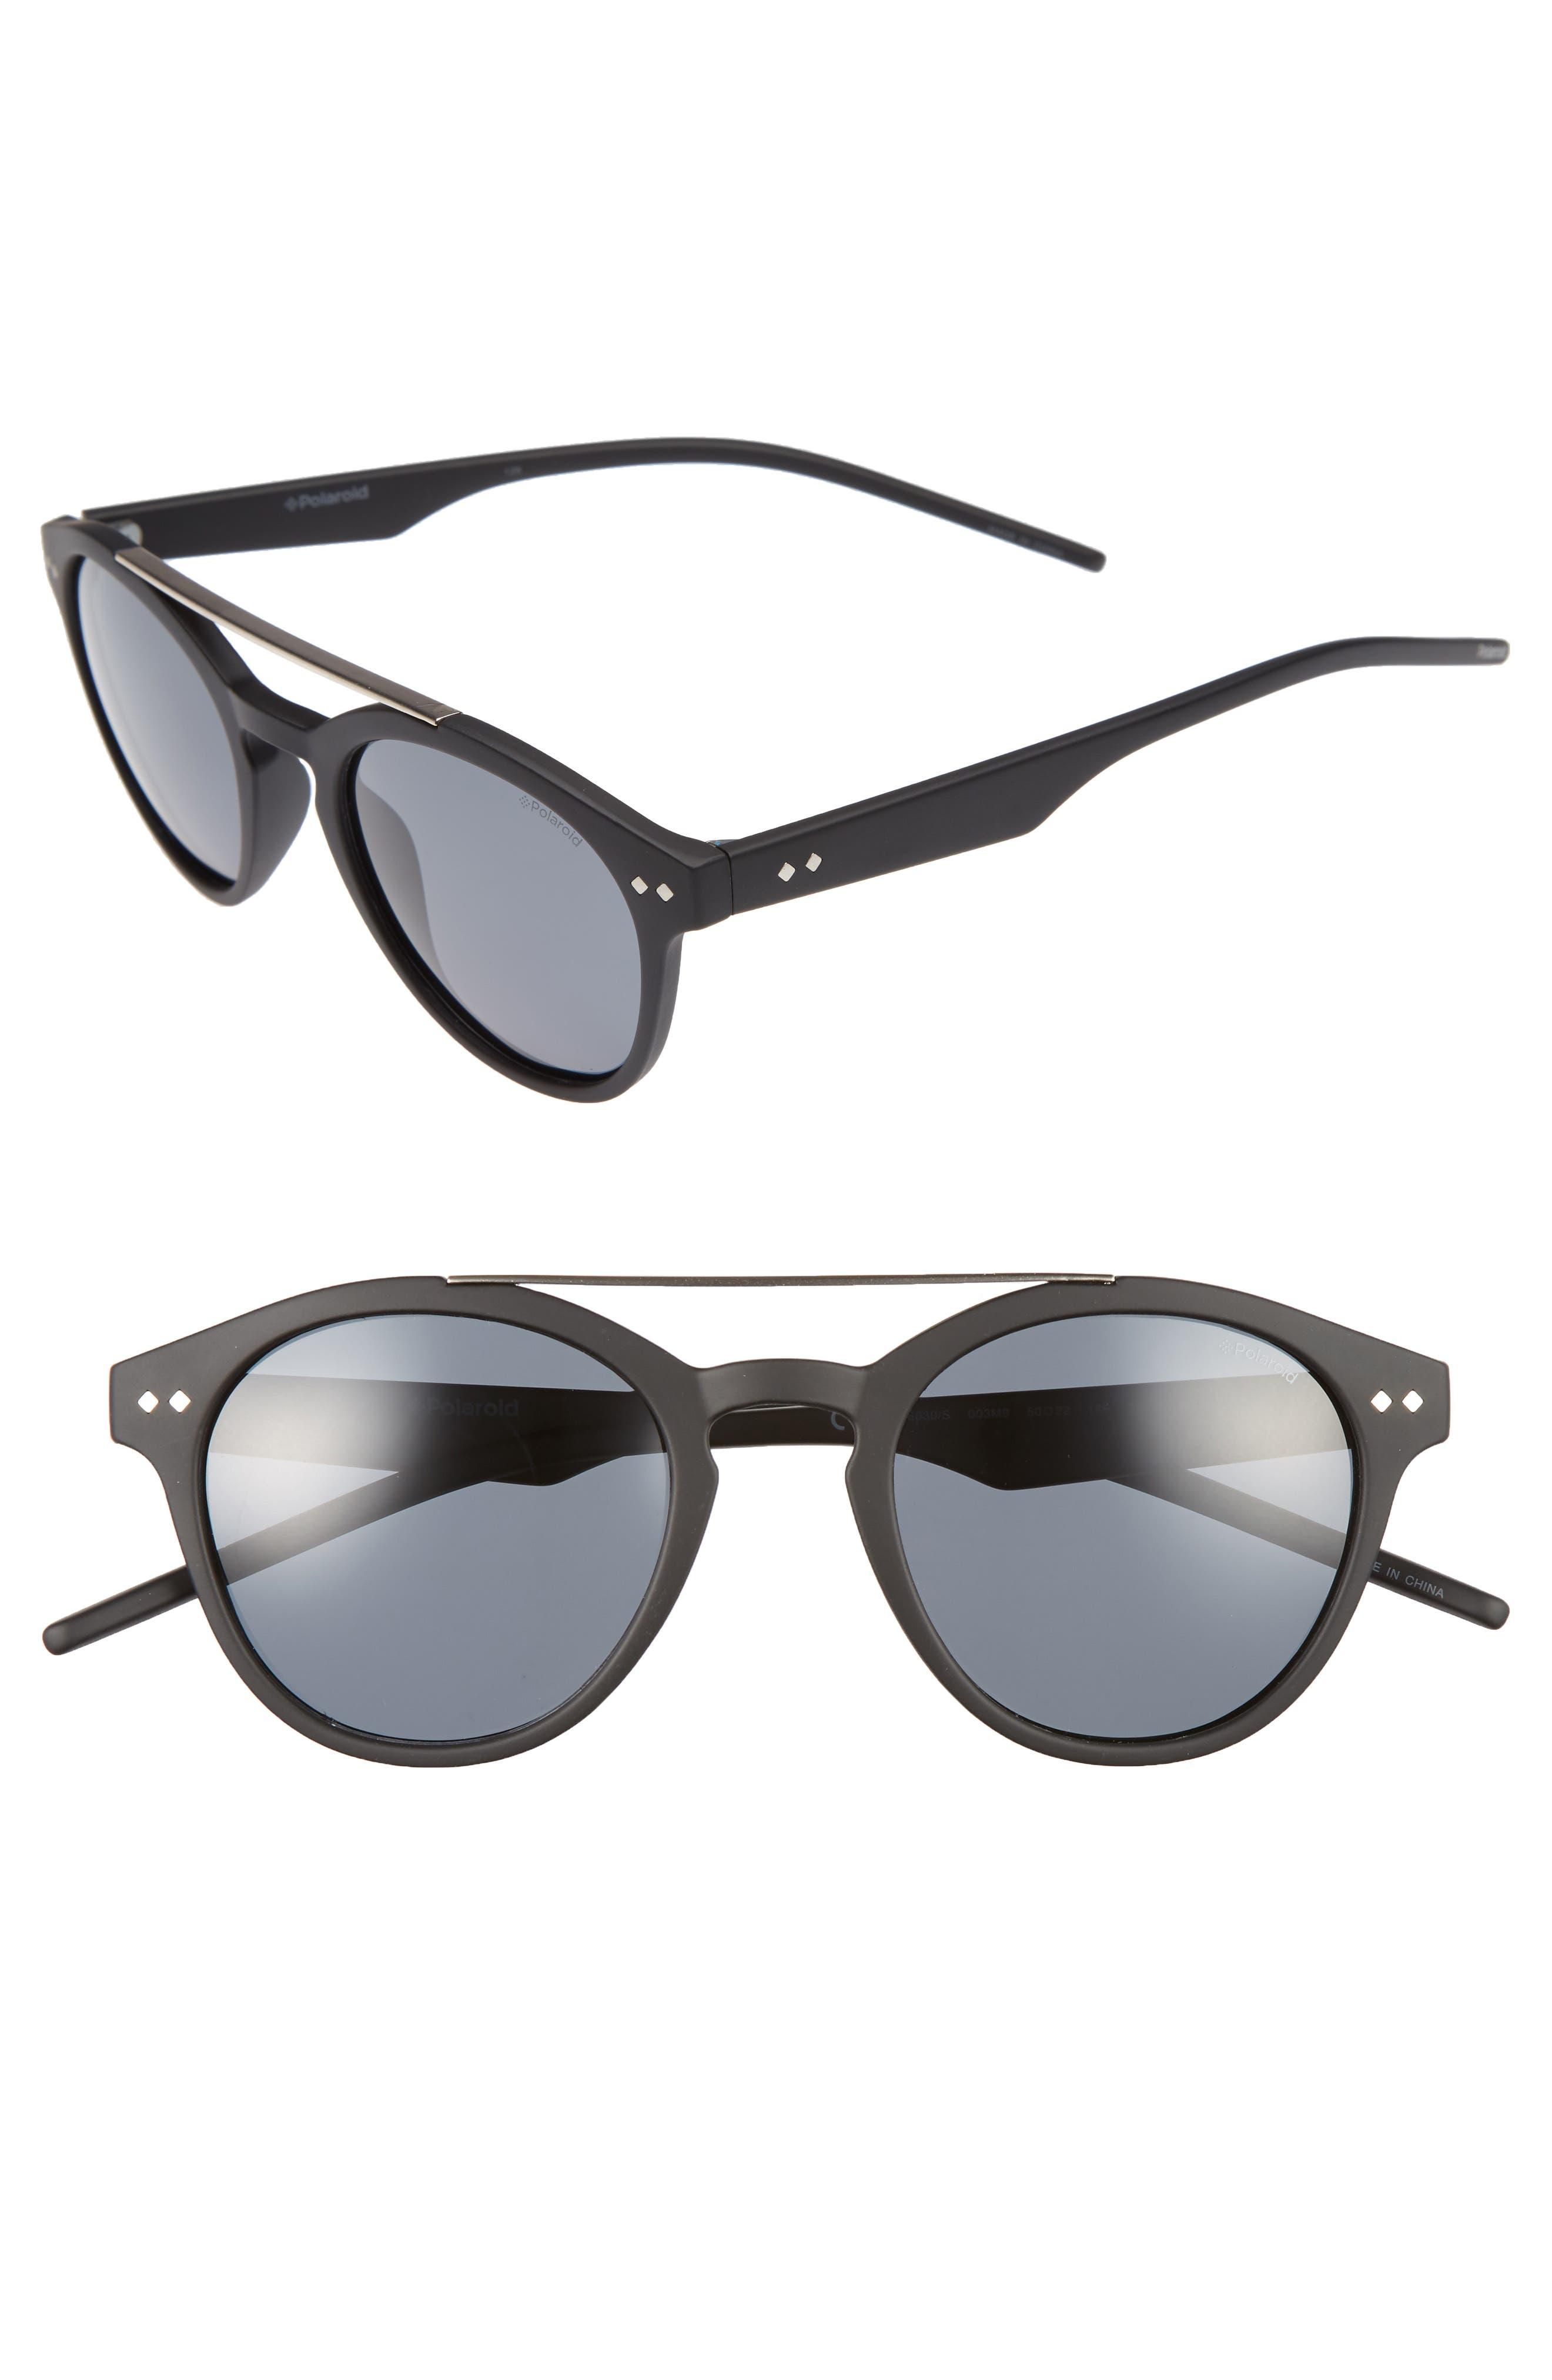 50mm Polarized Retro Sunglasses,                             Main thumbnail 1, color,                             001